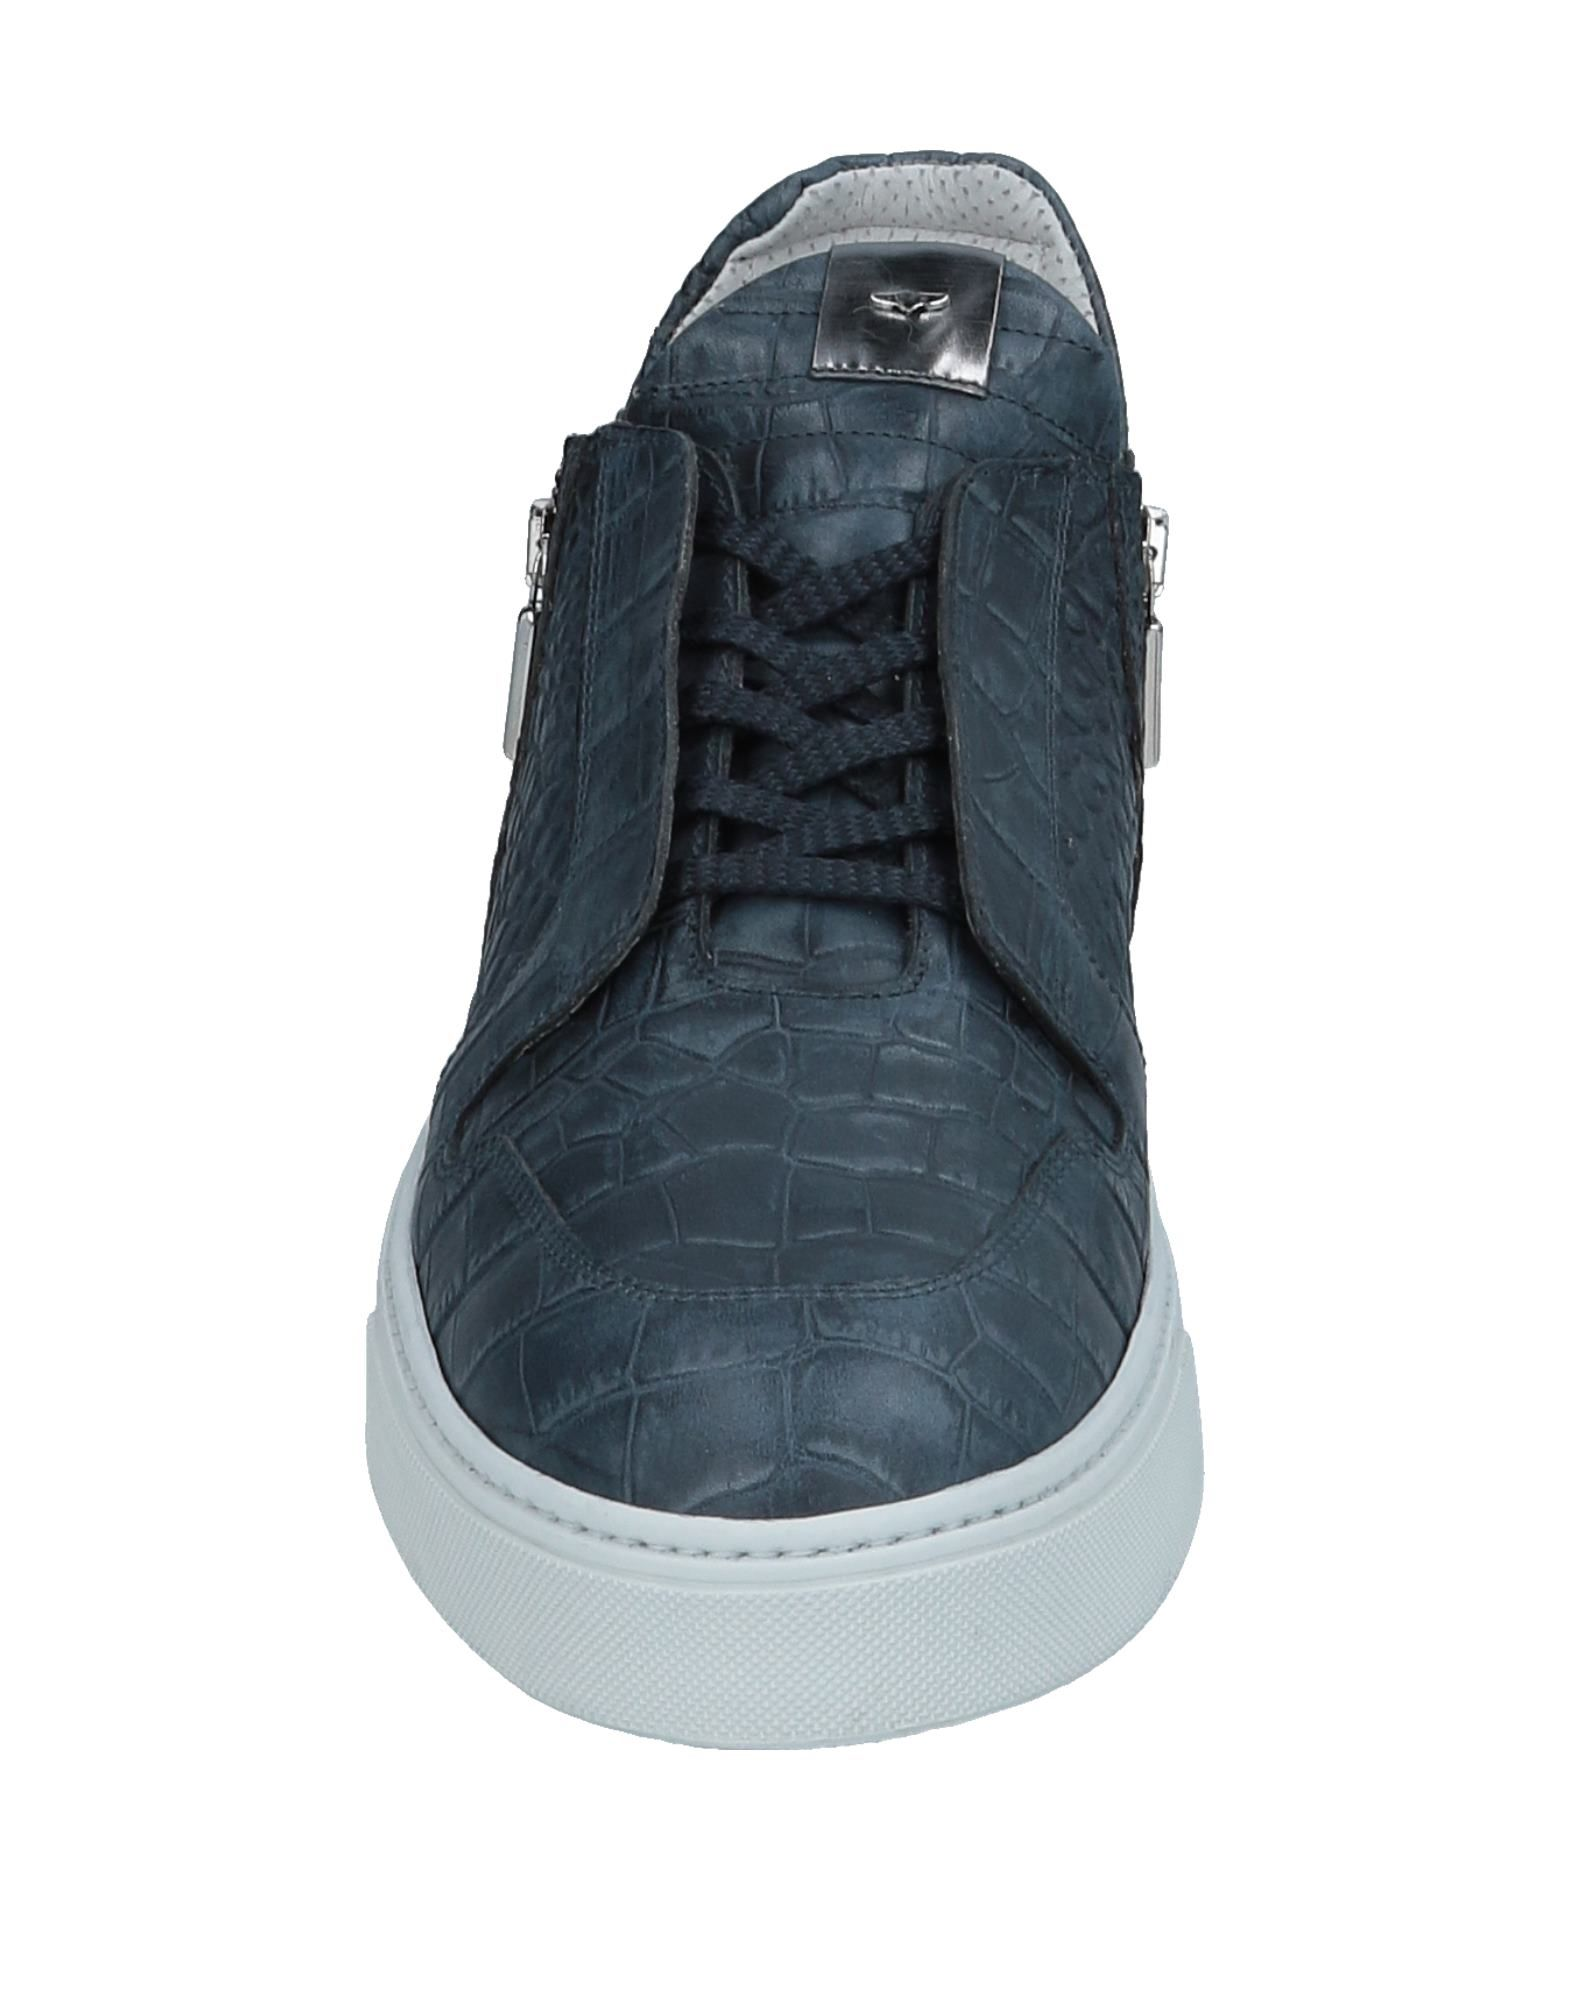 Alberto Alberto Alberto Guardiani Sneakers Herren  11146151SS f68631